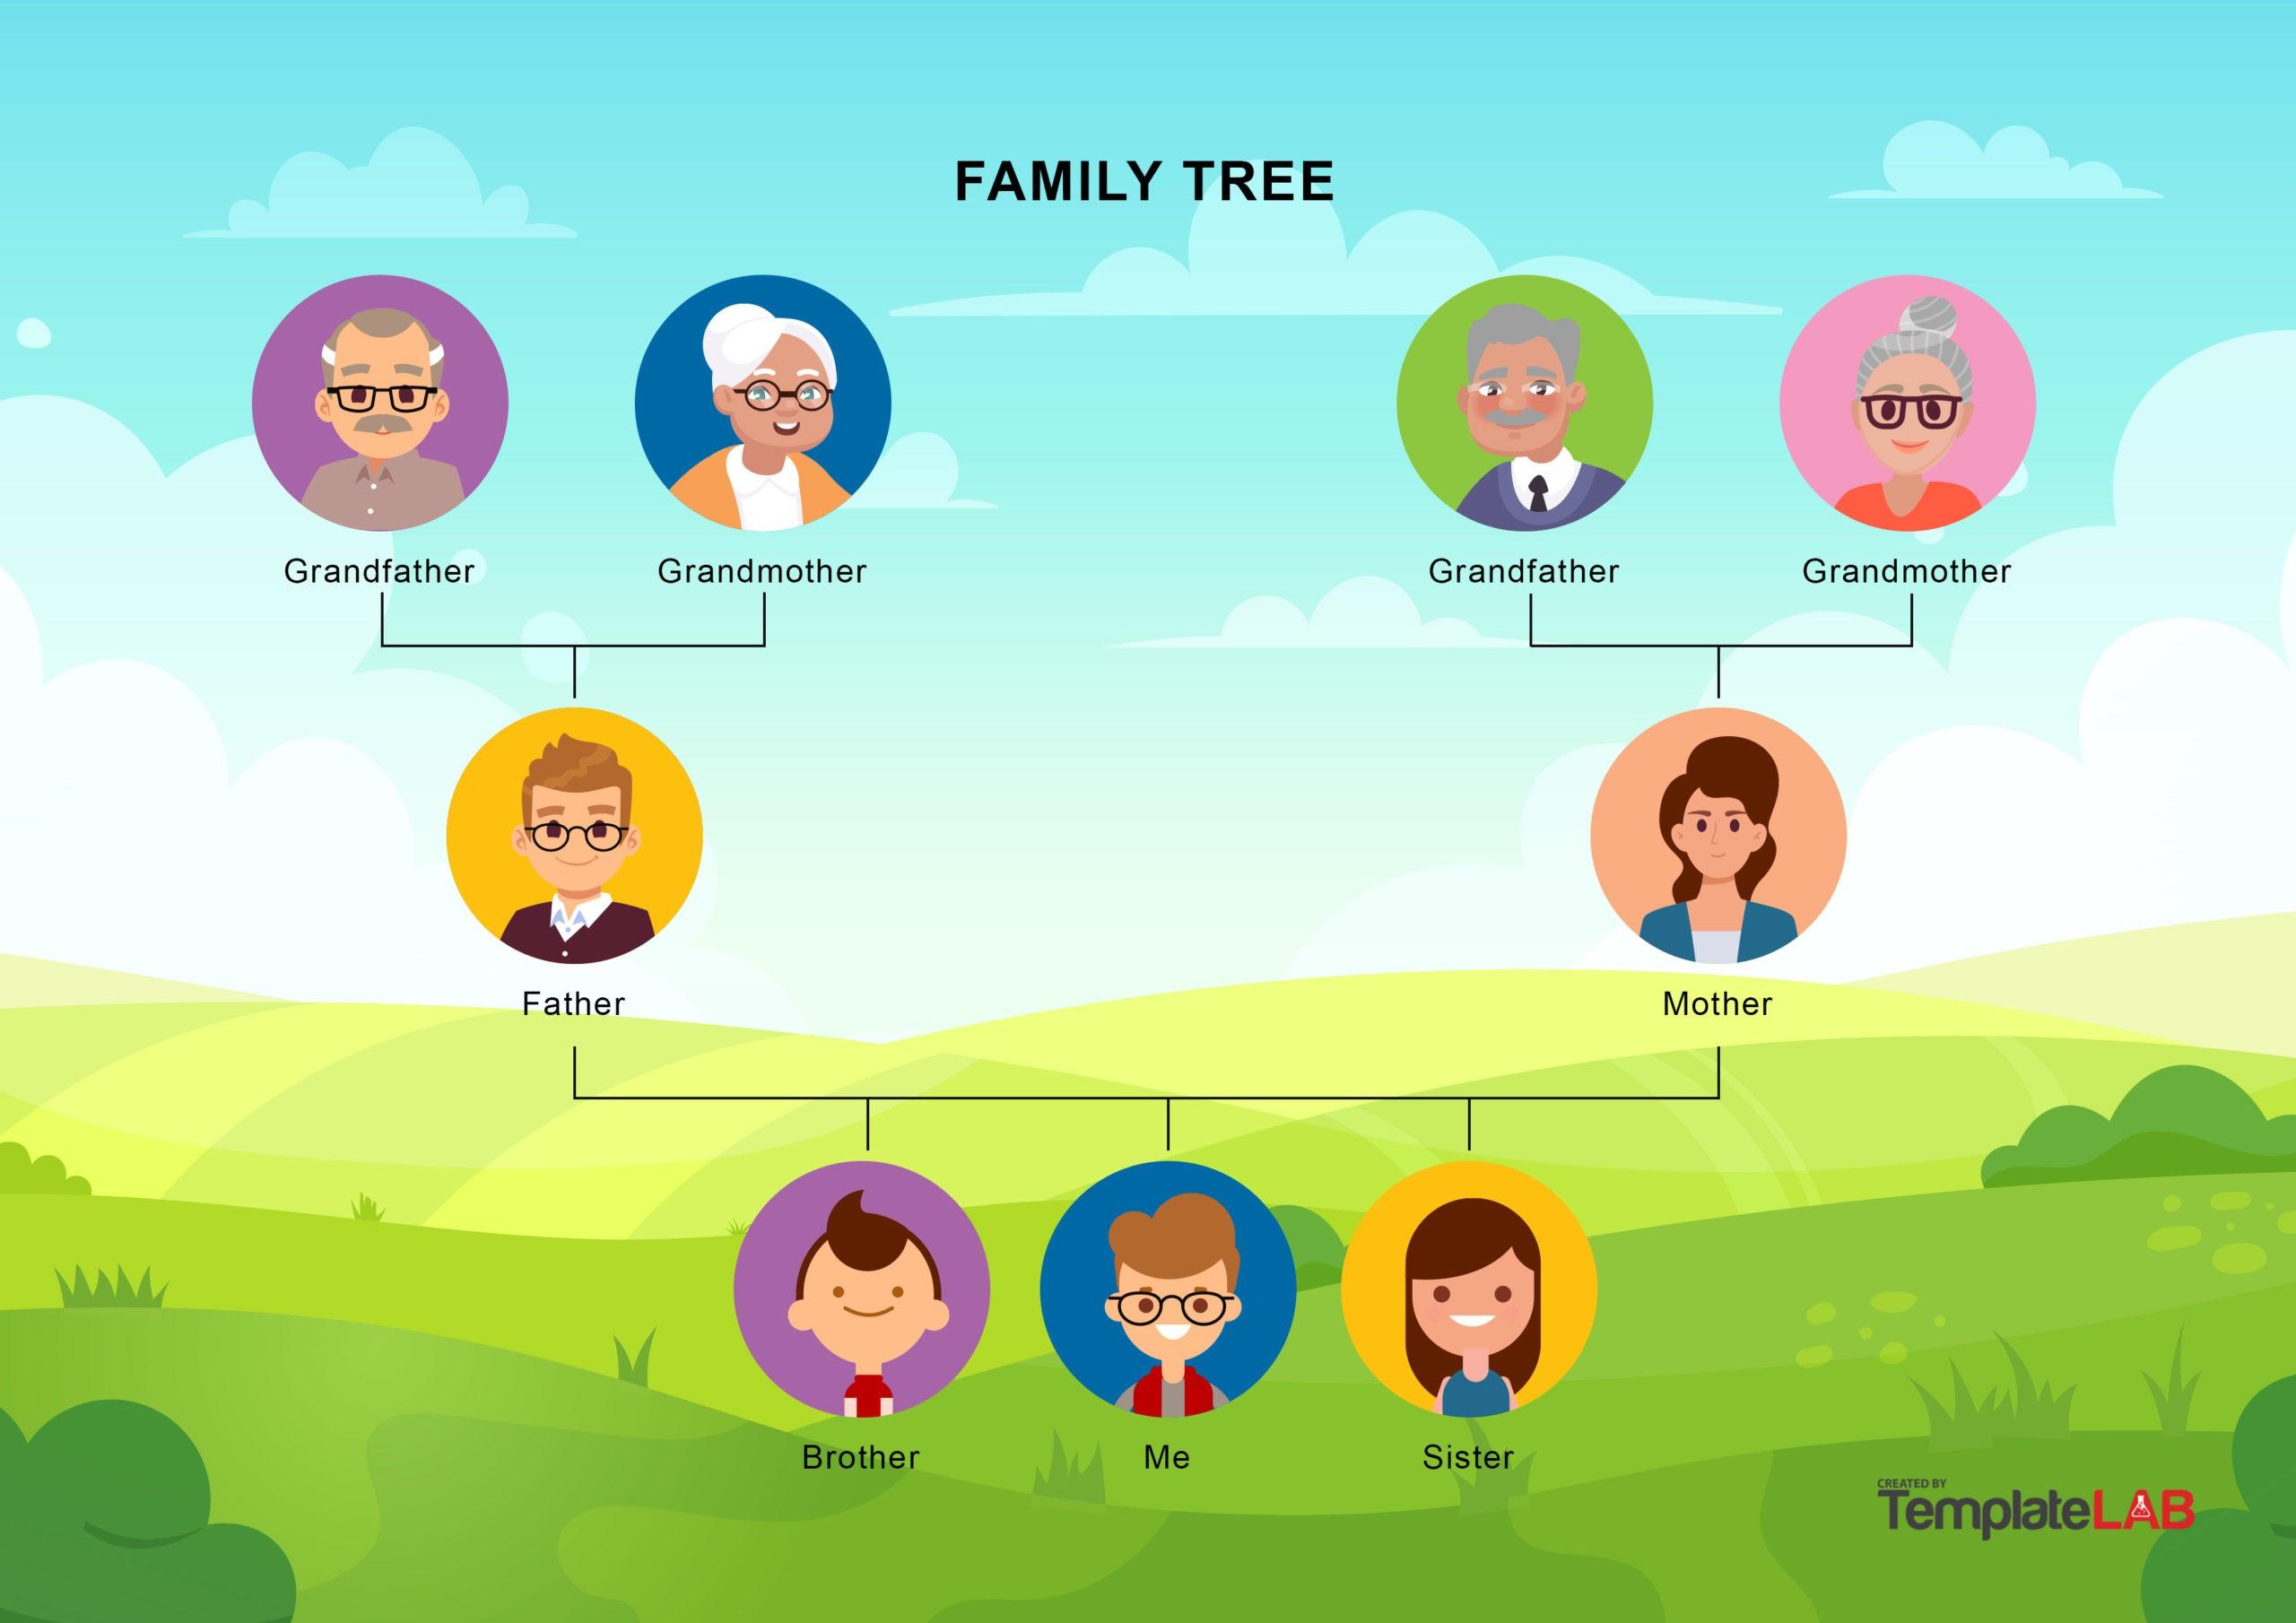 Free Family Tree Template 15 - TemplateLab.com